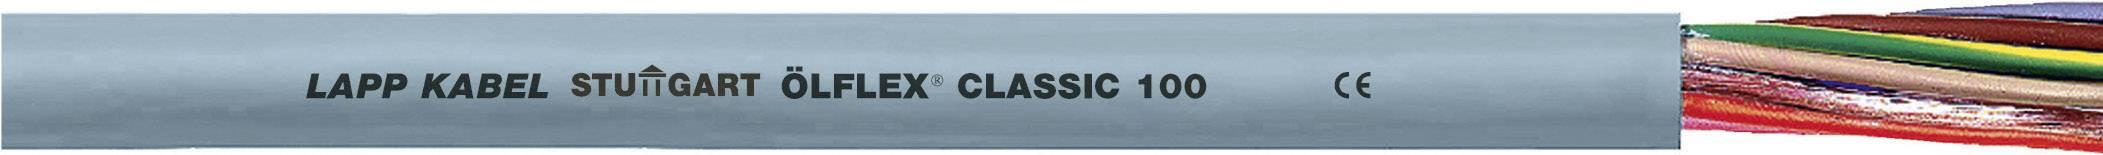 Kabel LappKabel Ölflex CLASSIC 100 50G0,75 (0010037), PVC, 19,2 mm, 500 V, šedá, 500 m